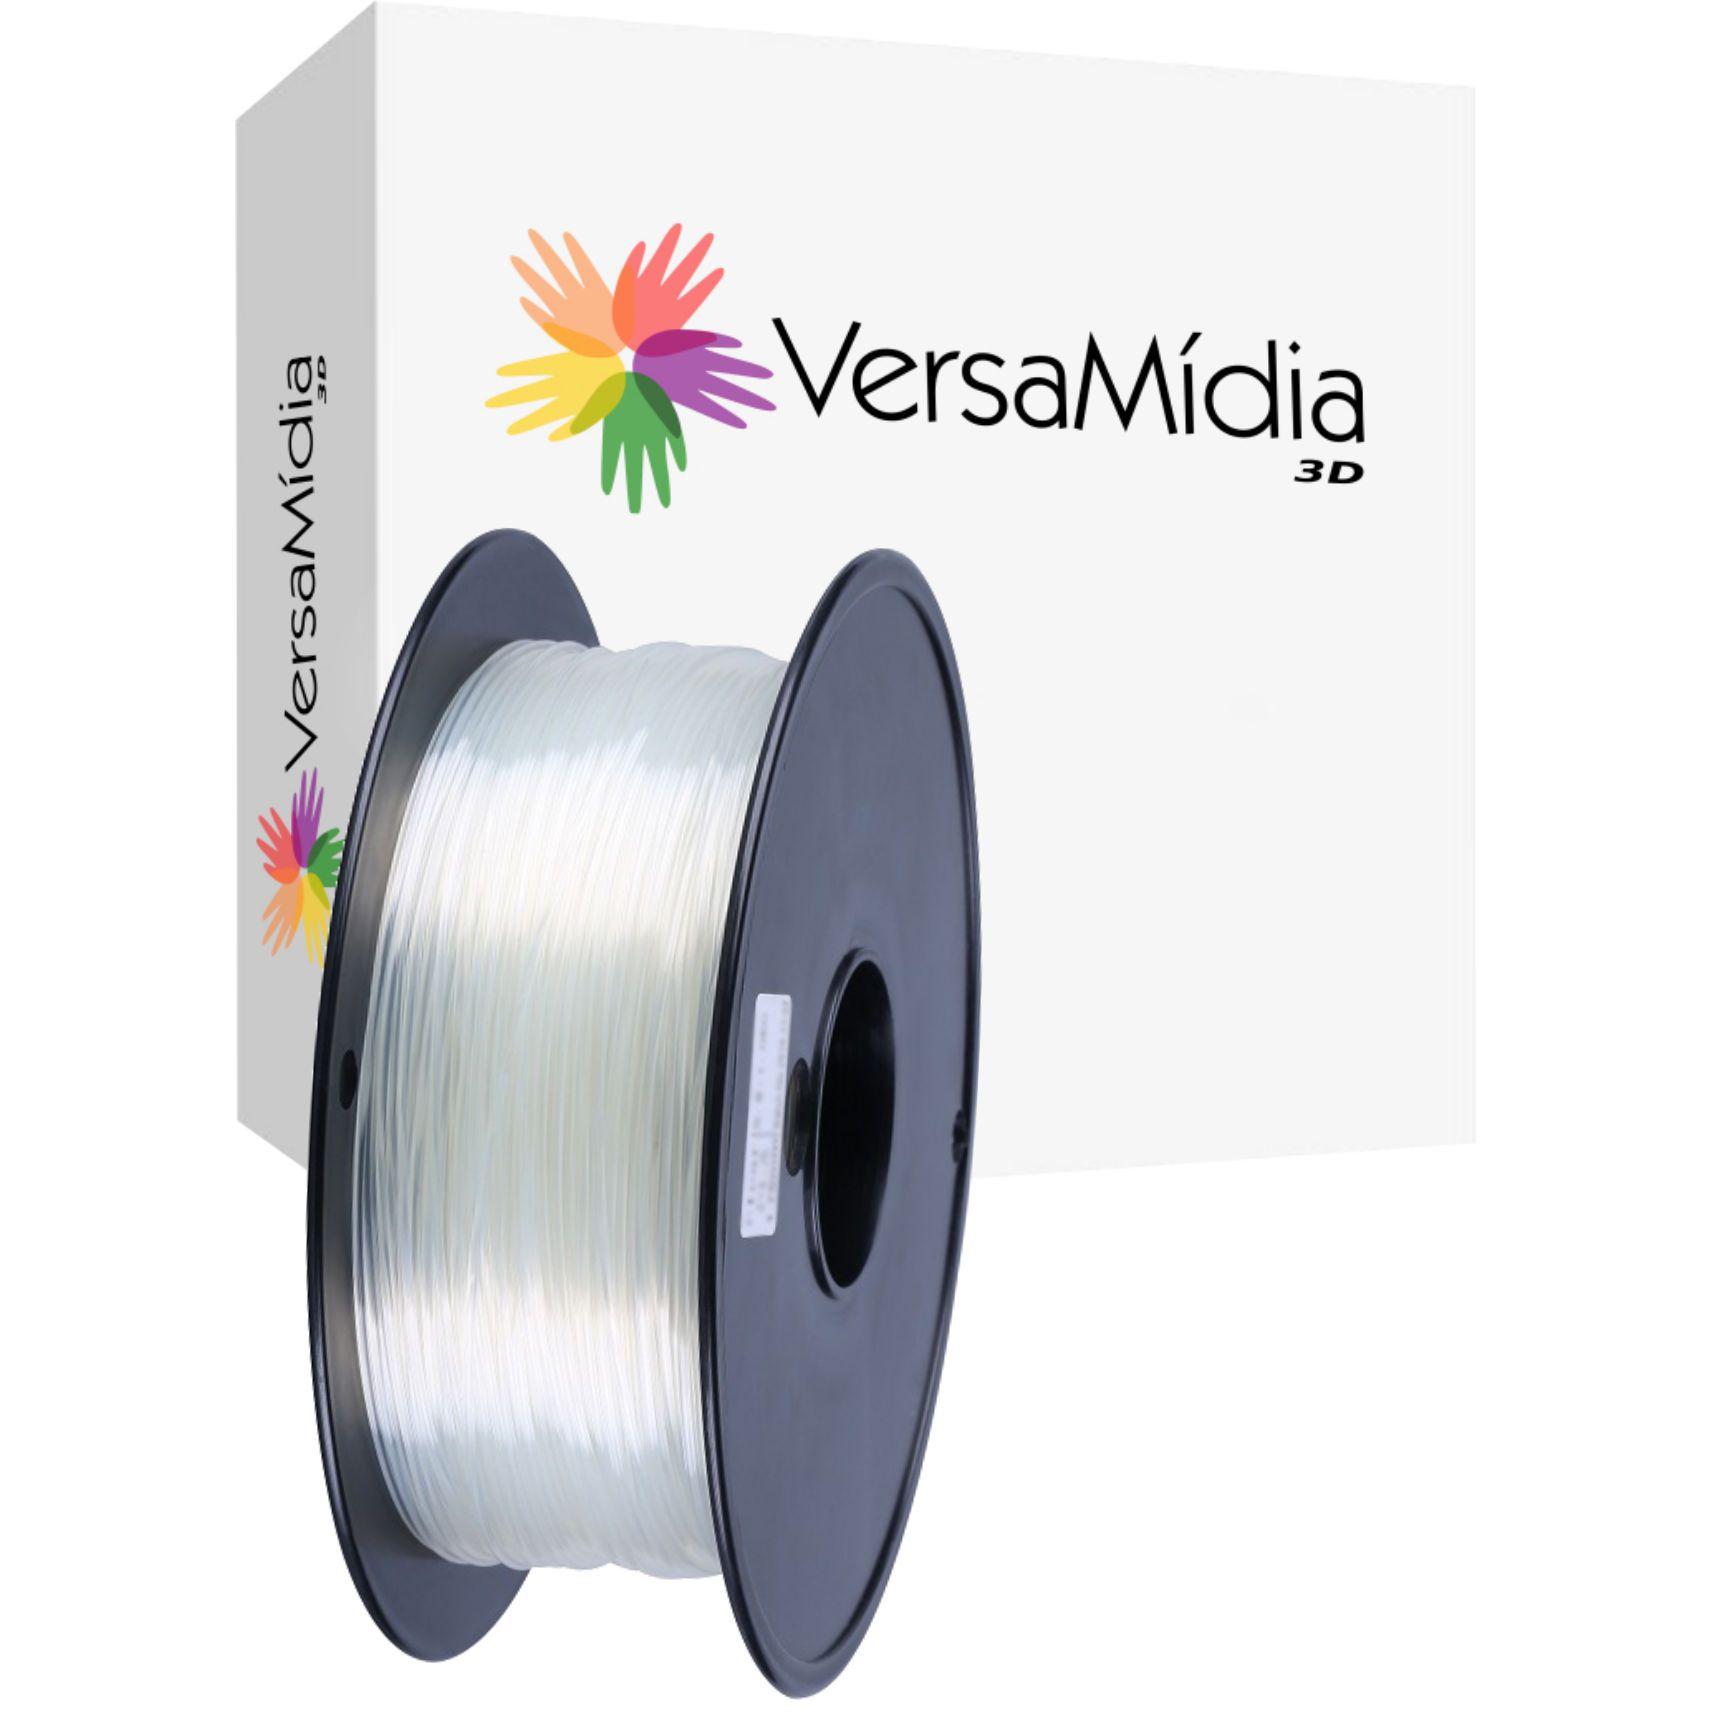 Filamento PETG Aditivado Policarbonato ( P-GLASS) Alta Transparência  1.75mm 0.8Kg  VersaMídia 3D - cód..11516